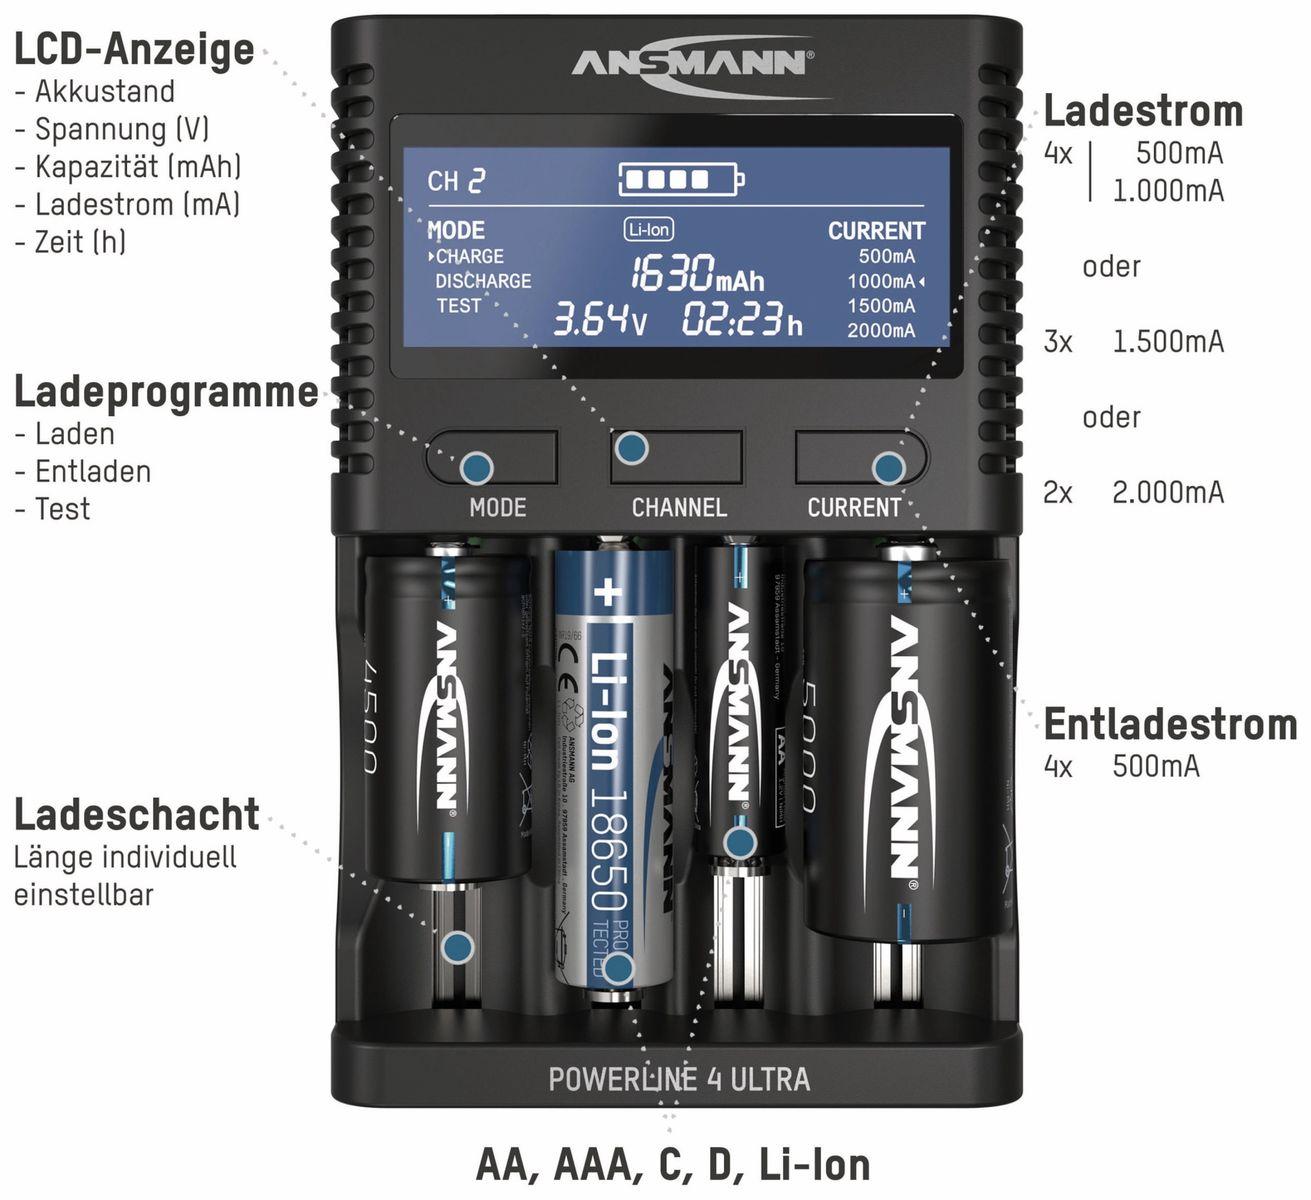 Ladegerät ANSMANN Powerline 4 Ultra online kaufen   Pollin.at